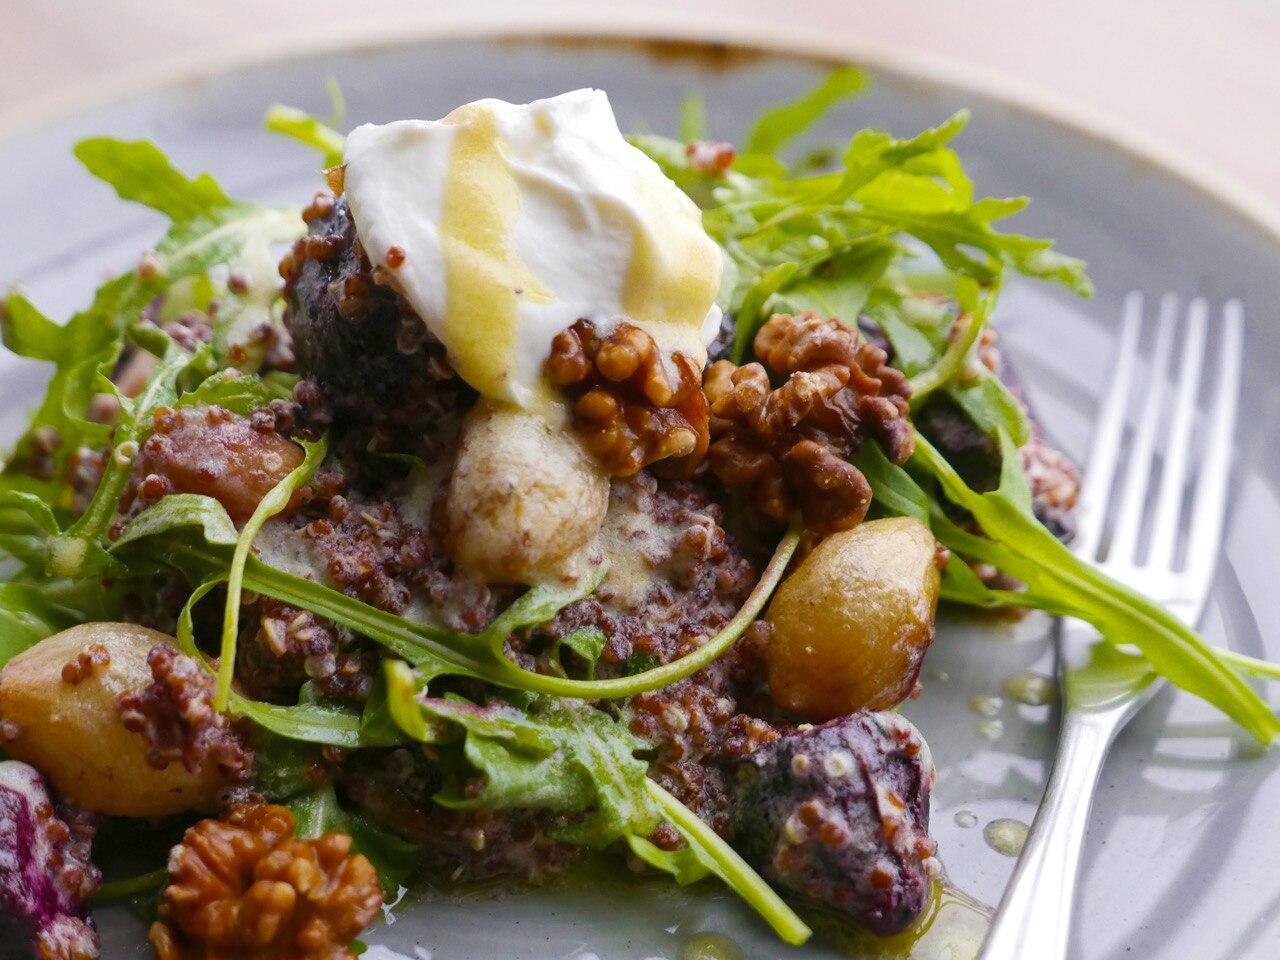 Roasted Baby Beet & Onion Salad